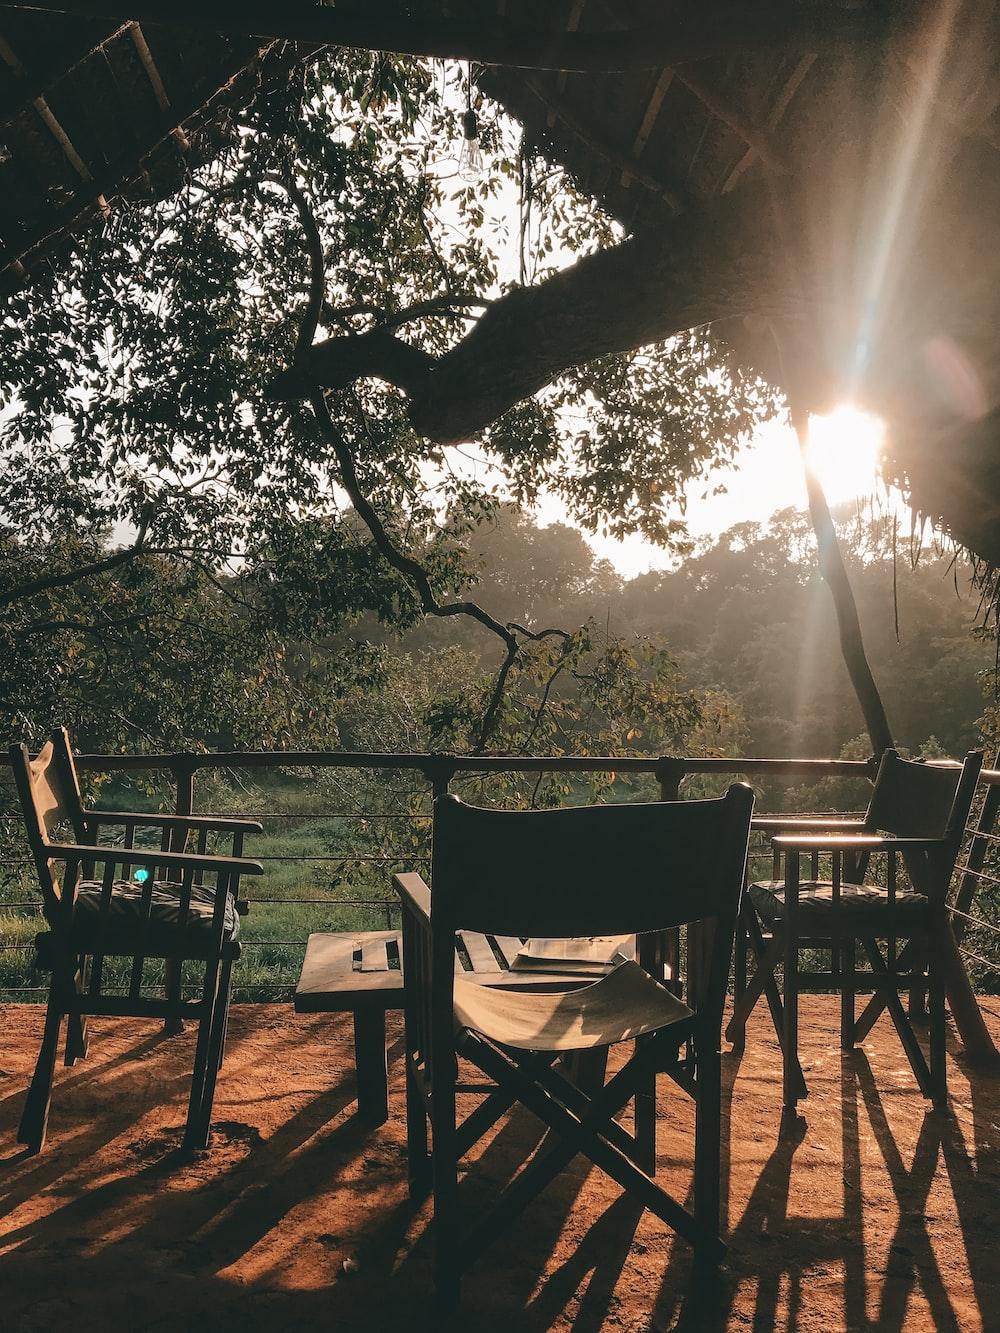 vacant bistro set during golden hour